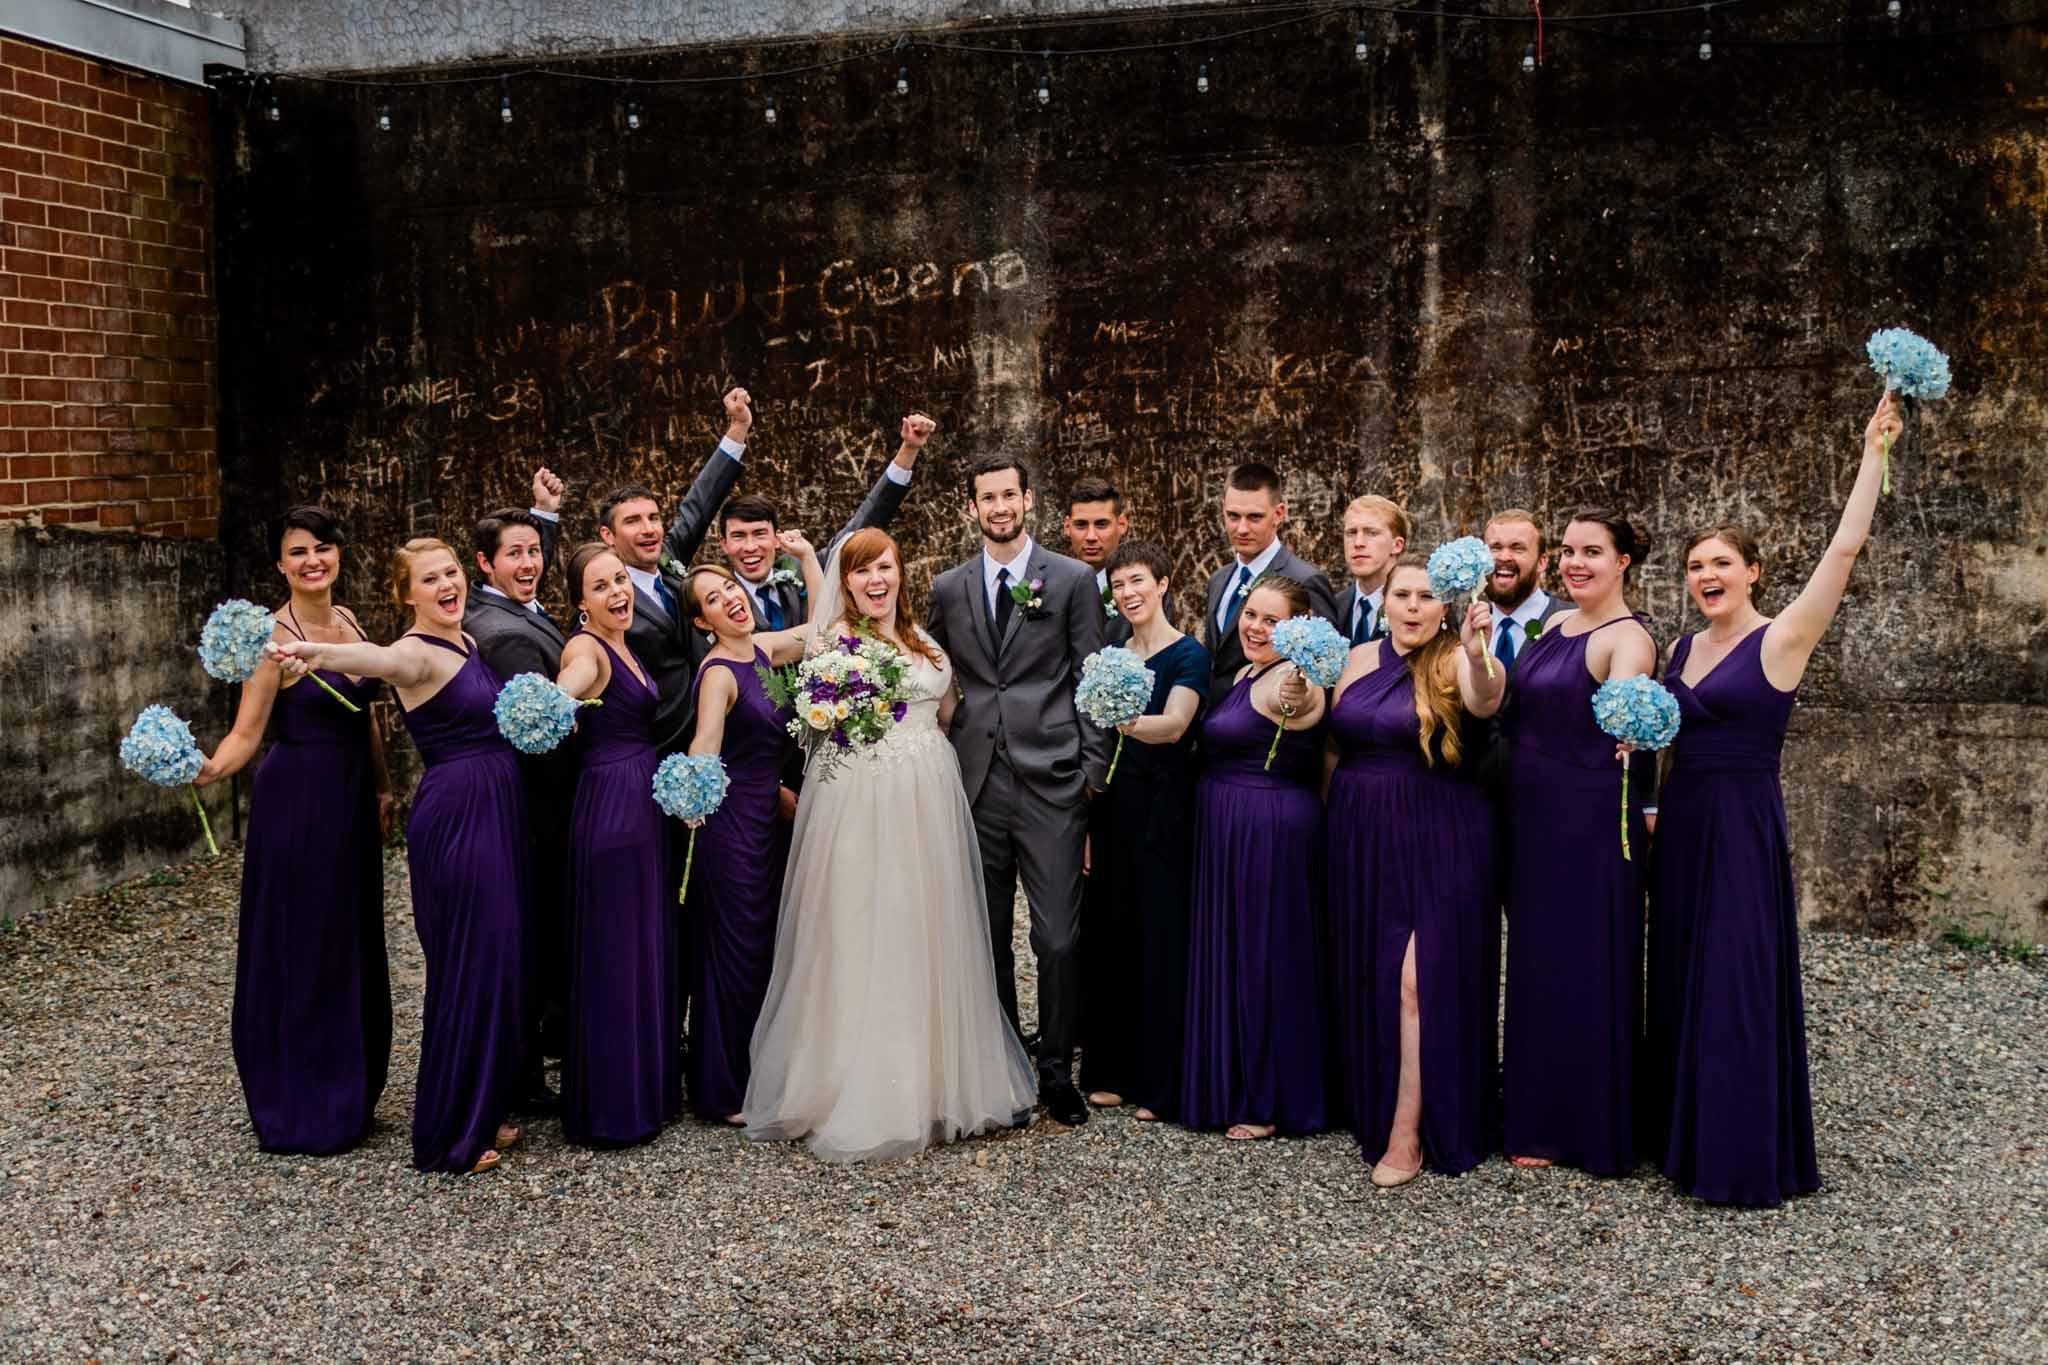 Haw River Ballroom Wedding   Durham Wedding Photographer   By G. Lin Photography   Wedding party cheering